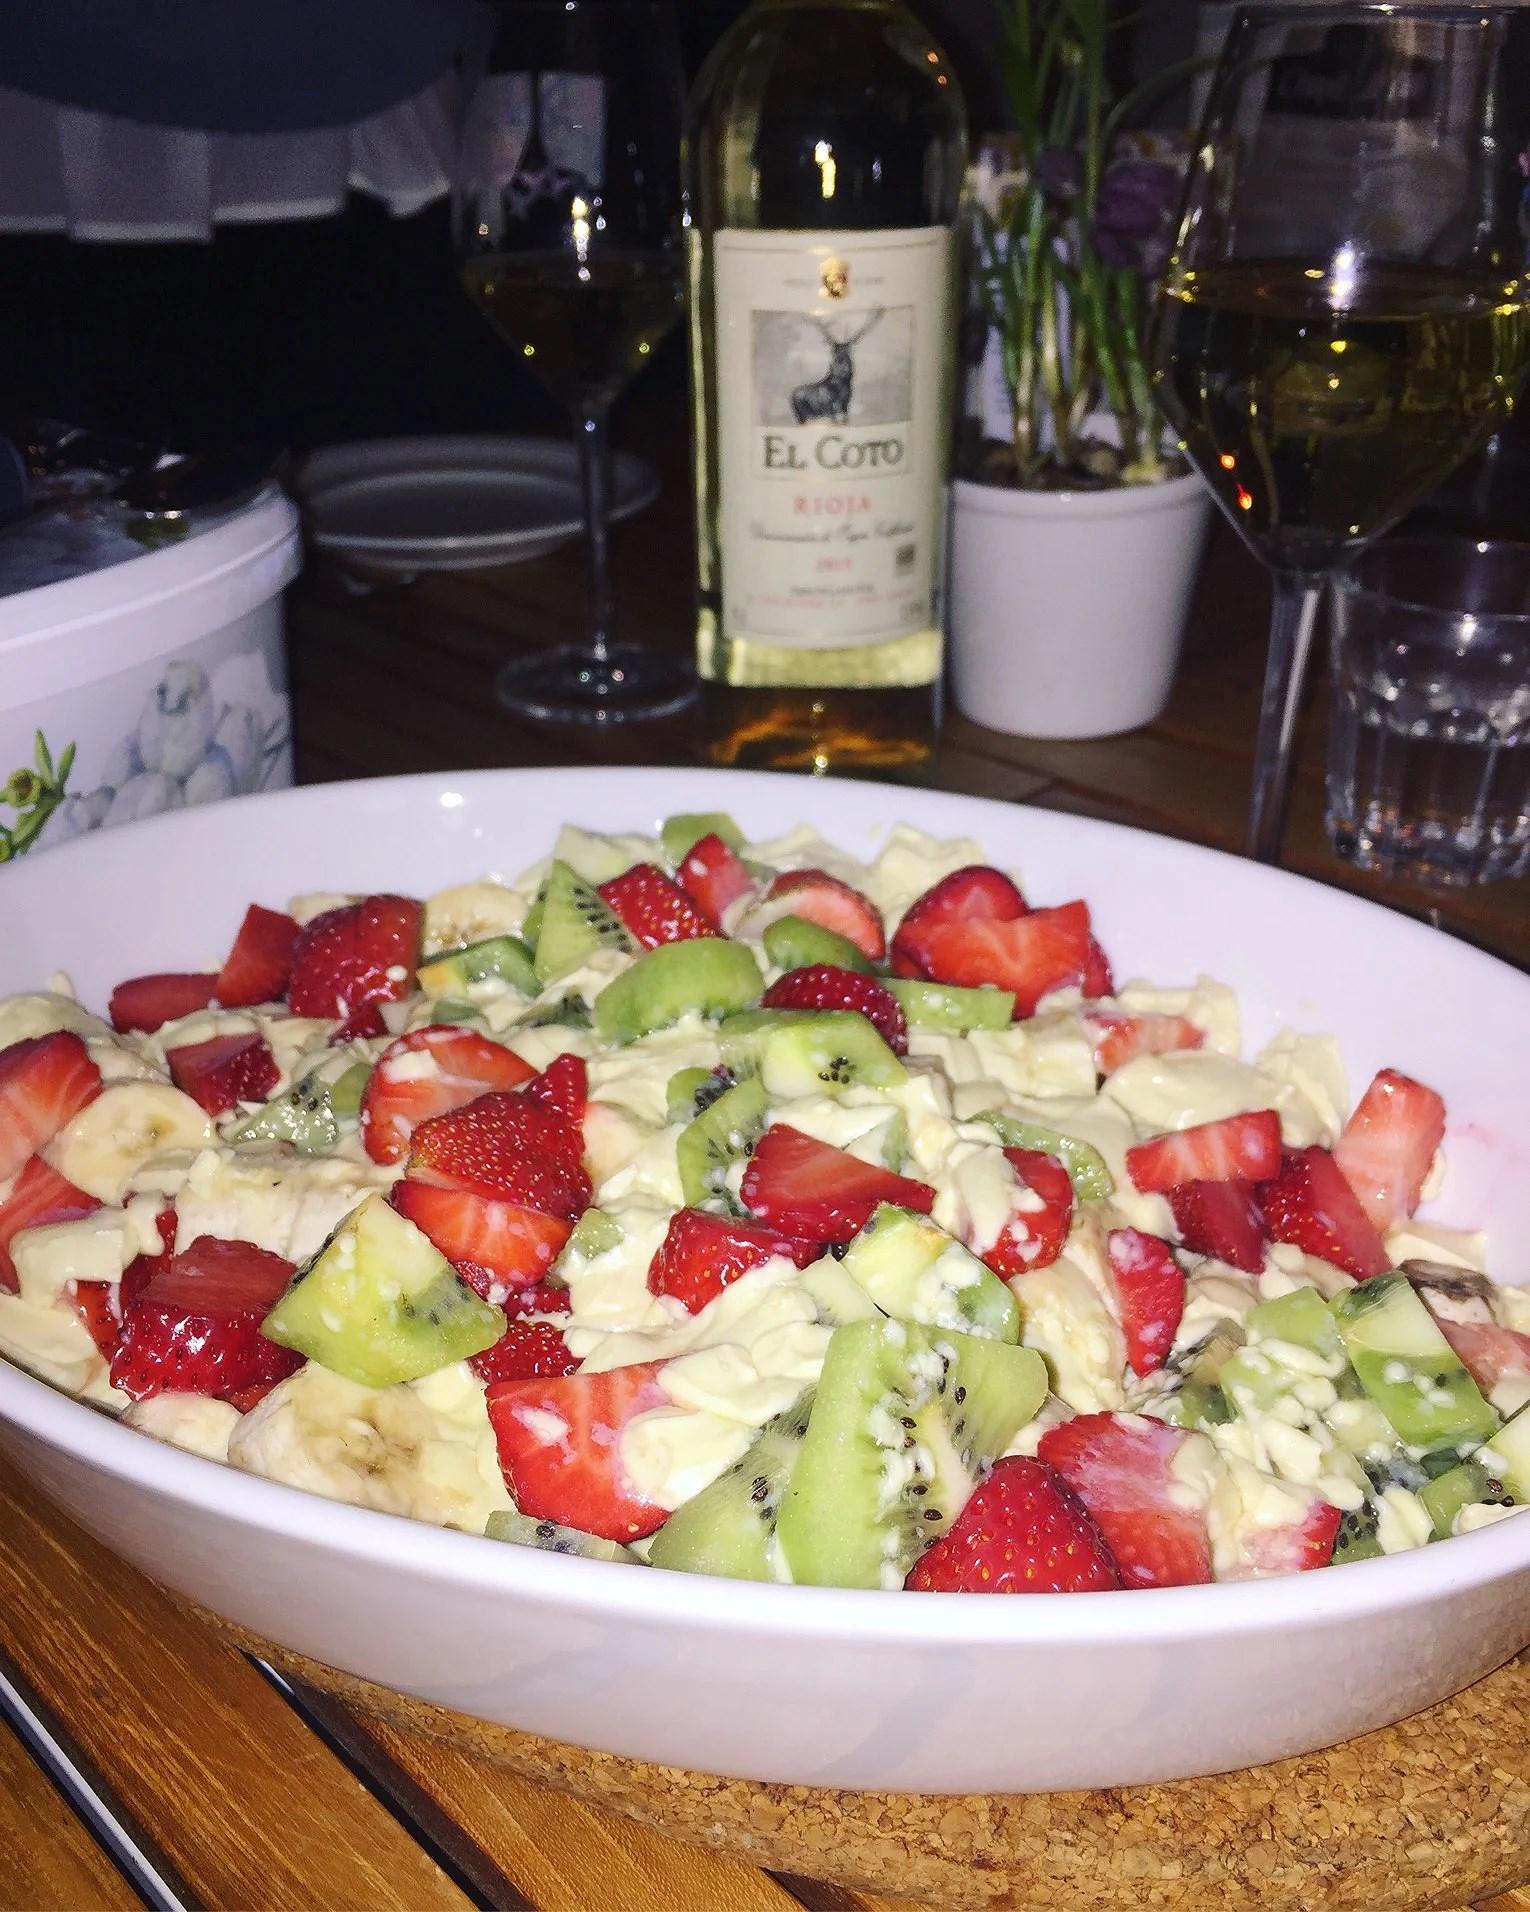 Wine and pasta evening